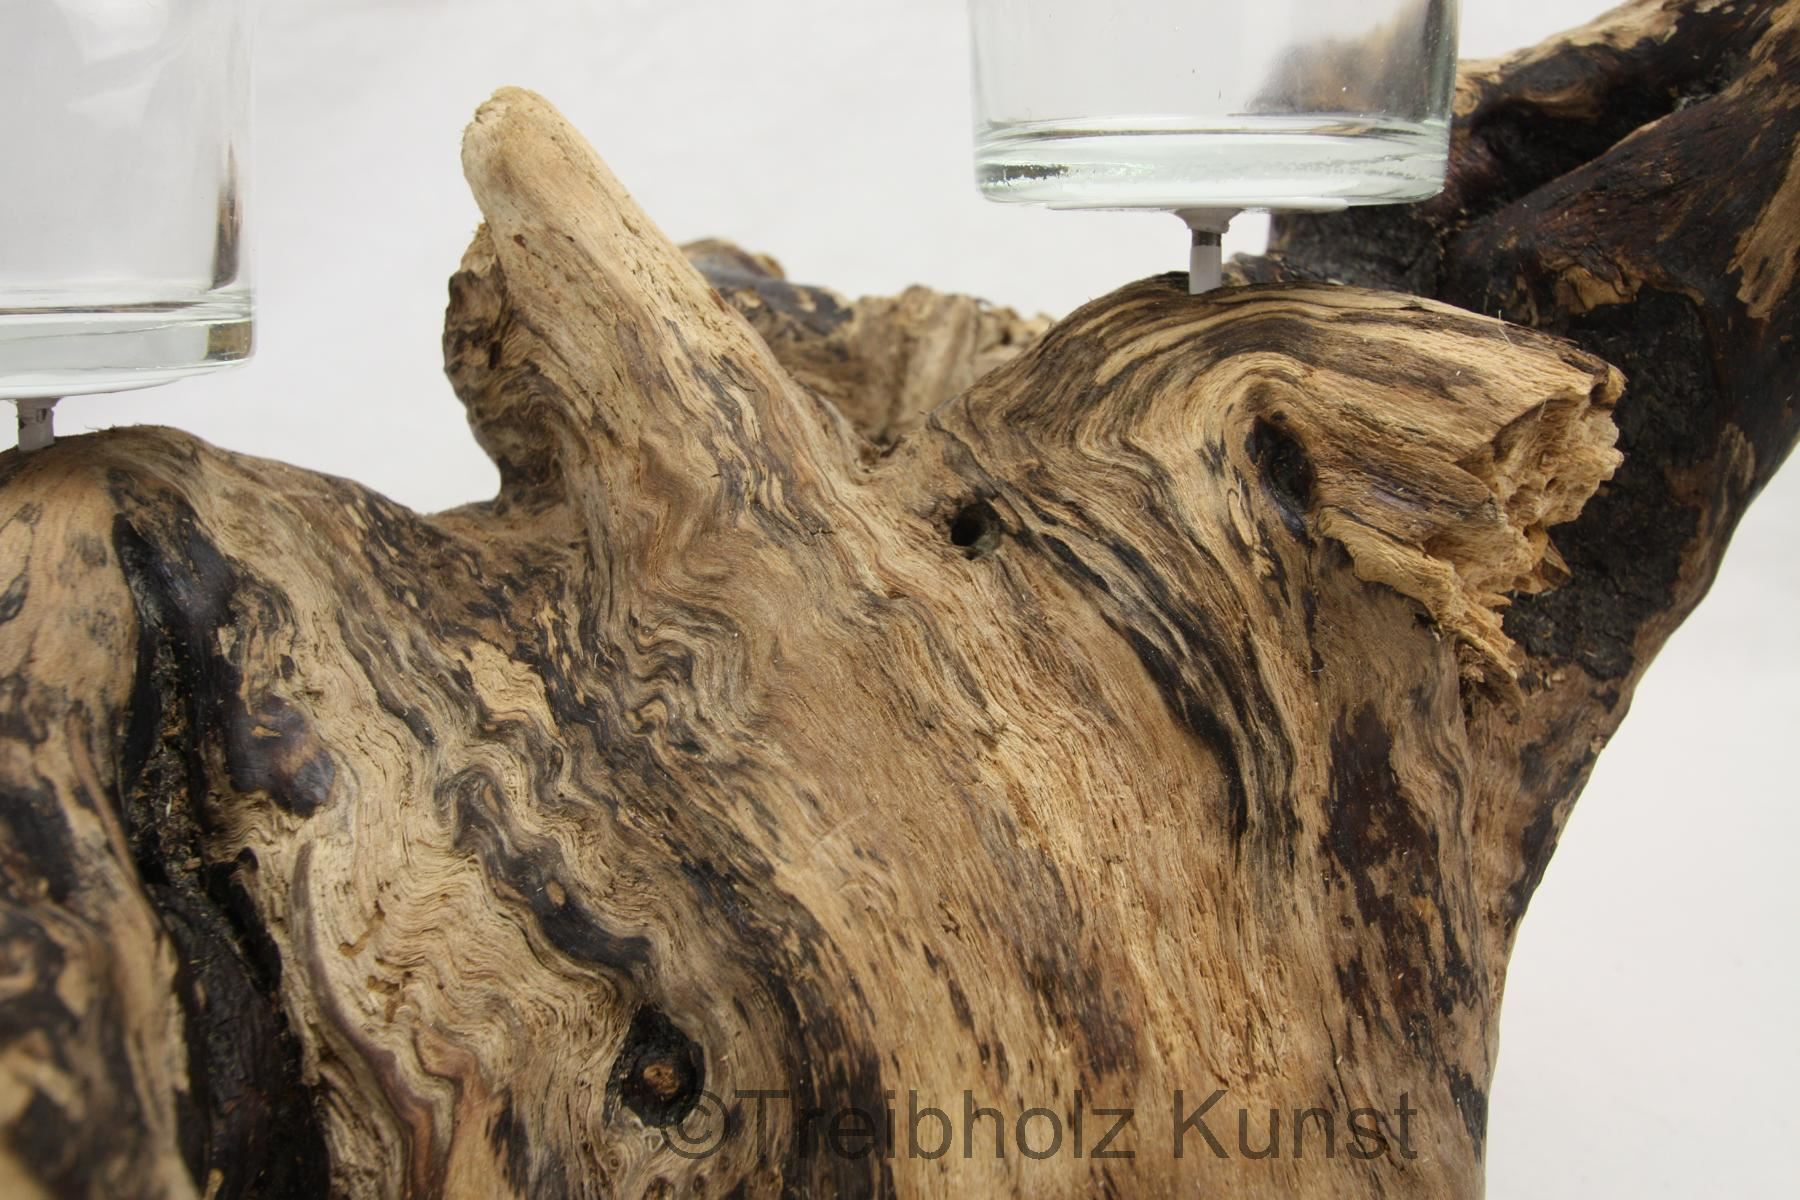 windteelicht wurzel treibholz unikat driftwood. Black Bedroom Furniture Sets. Home Design Ideas